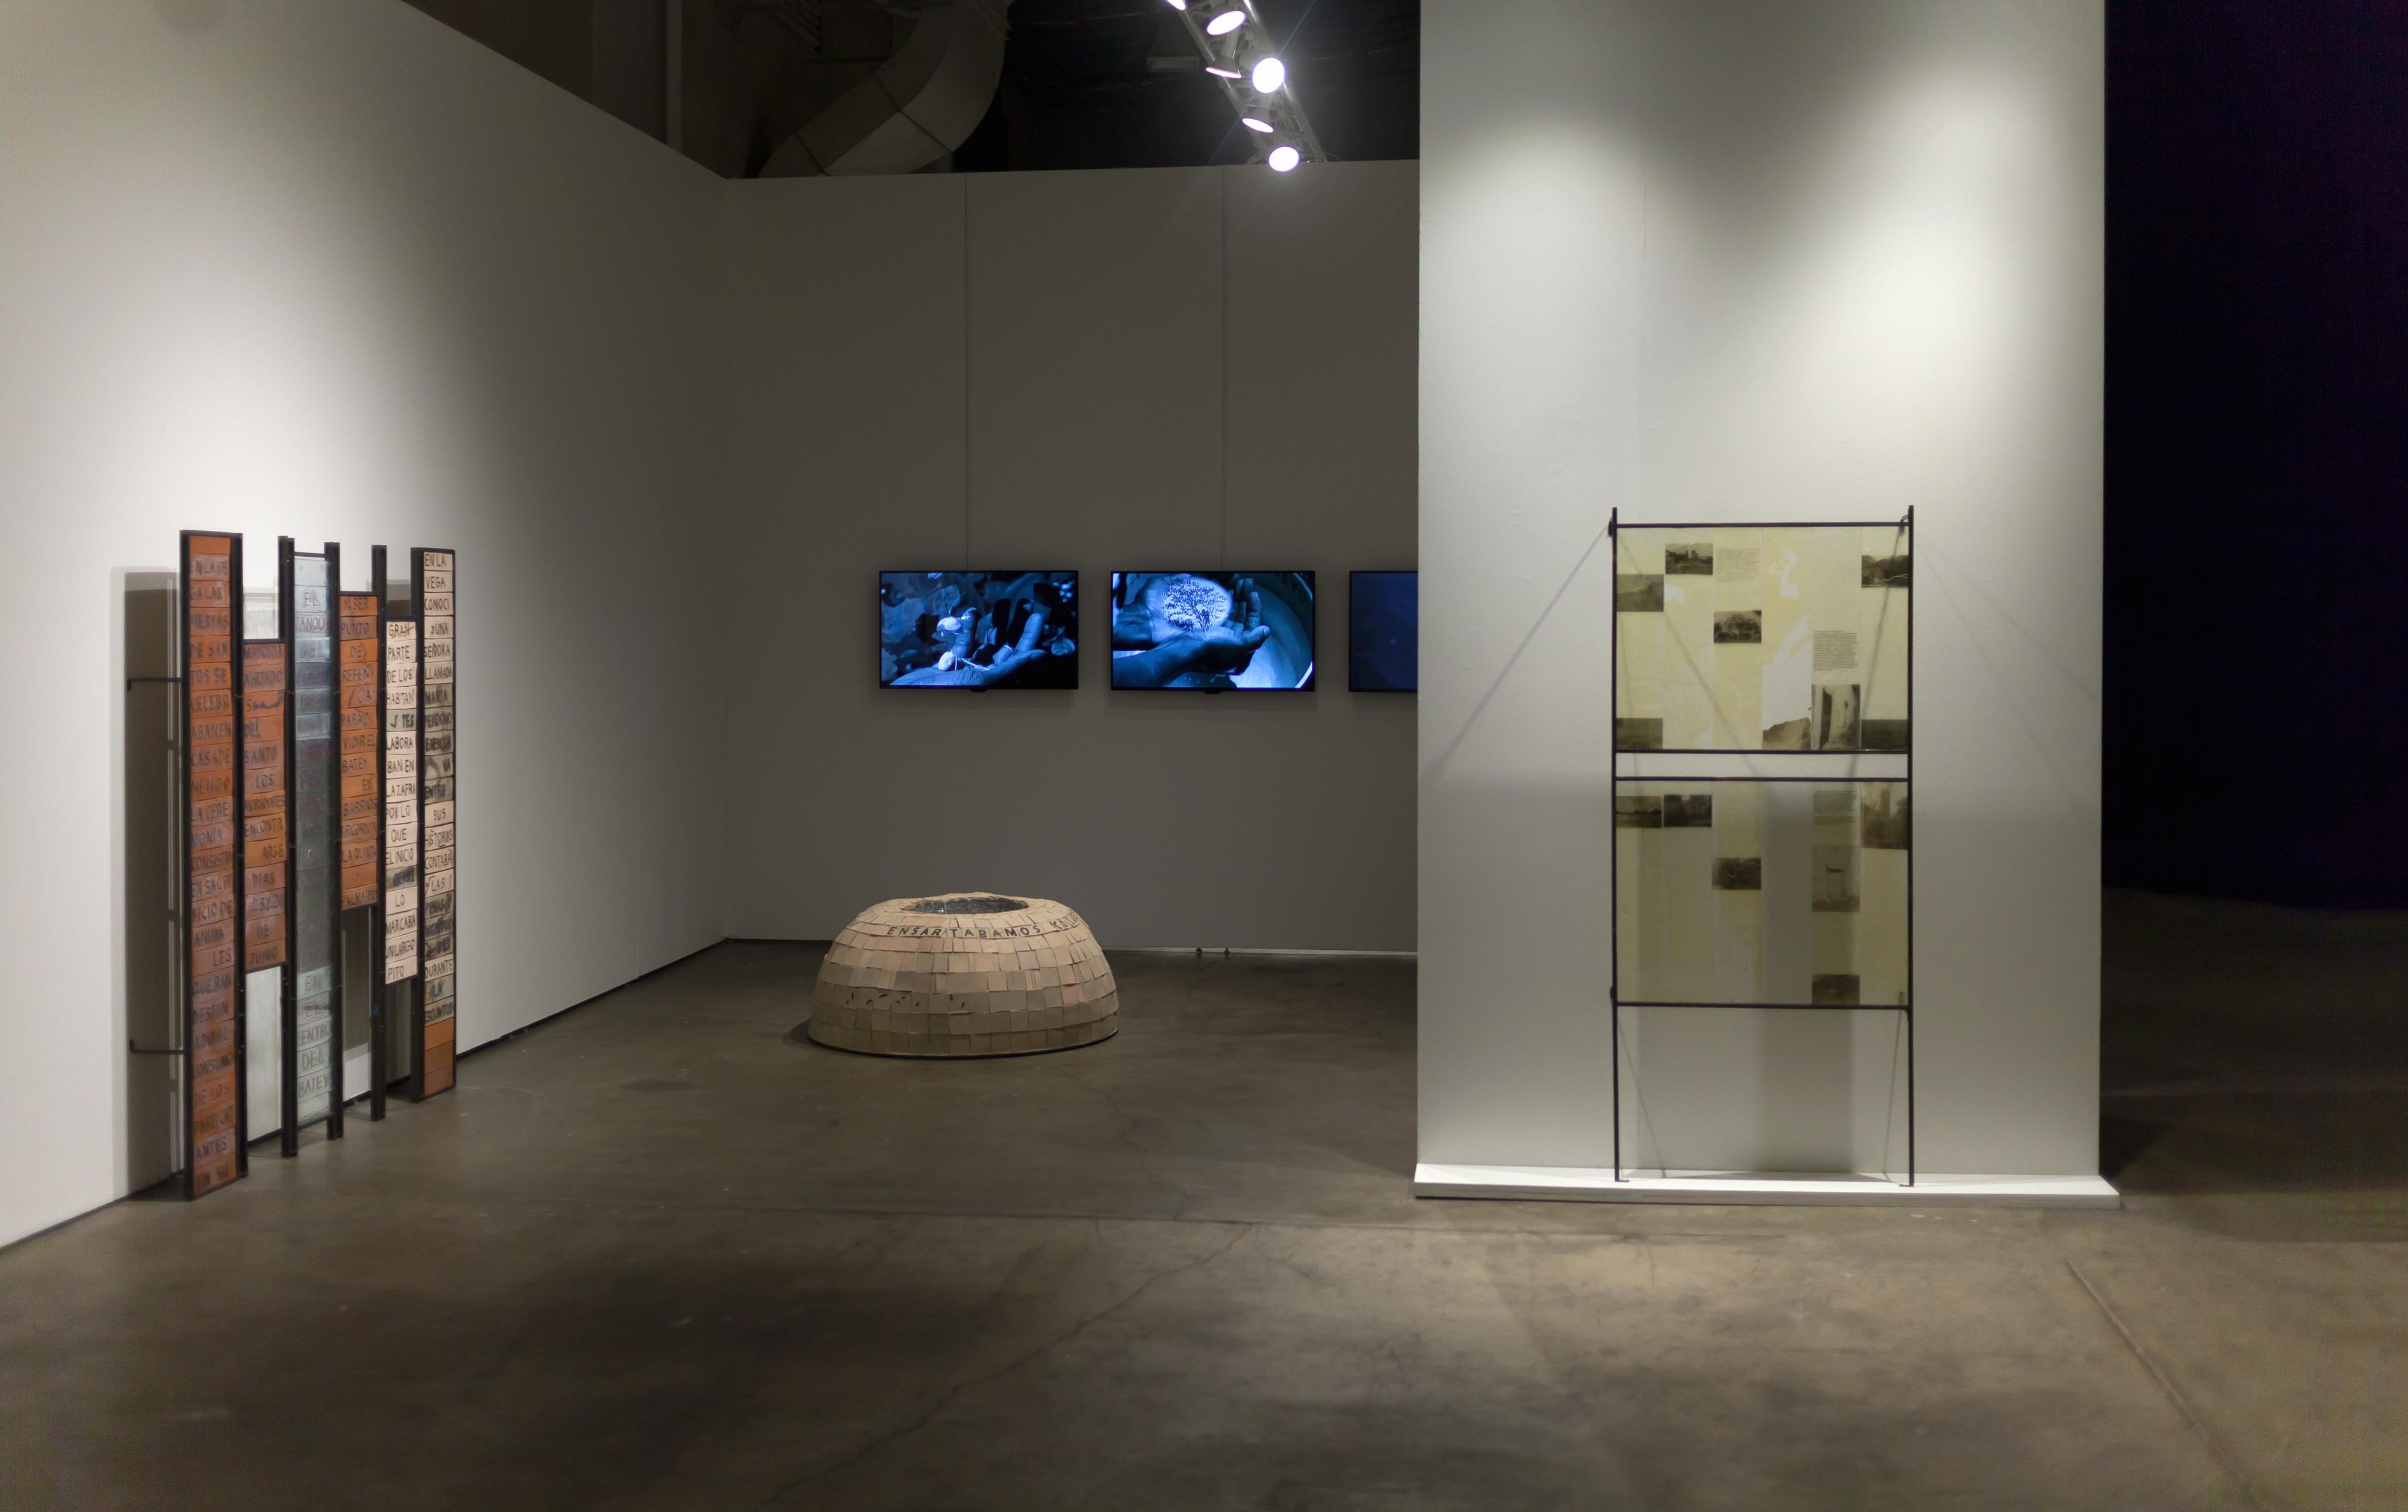 Galerie Barbara Thumm \ María Magdalena Campos-Pons